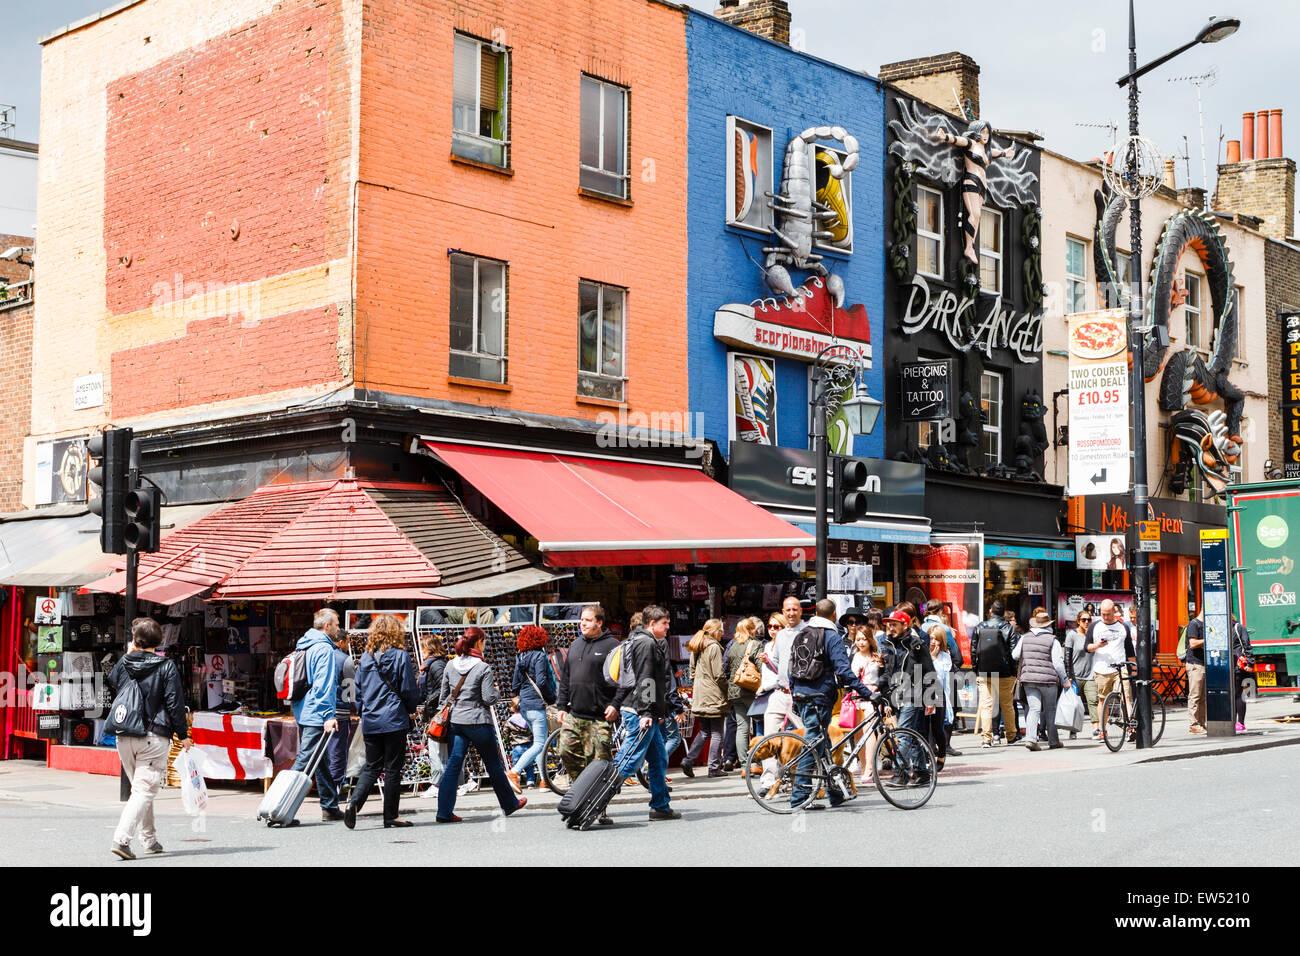 Pedestrians on Camden High Street, London, England, UK - Stock Image